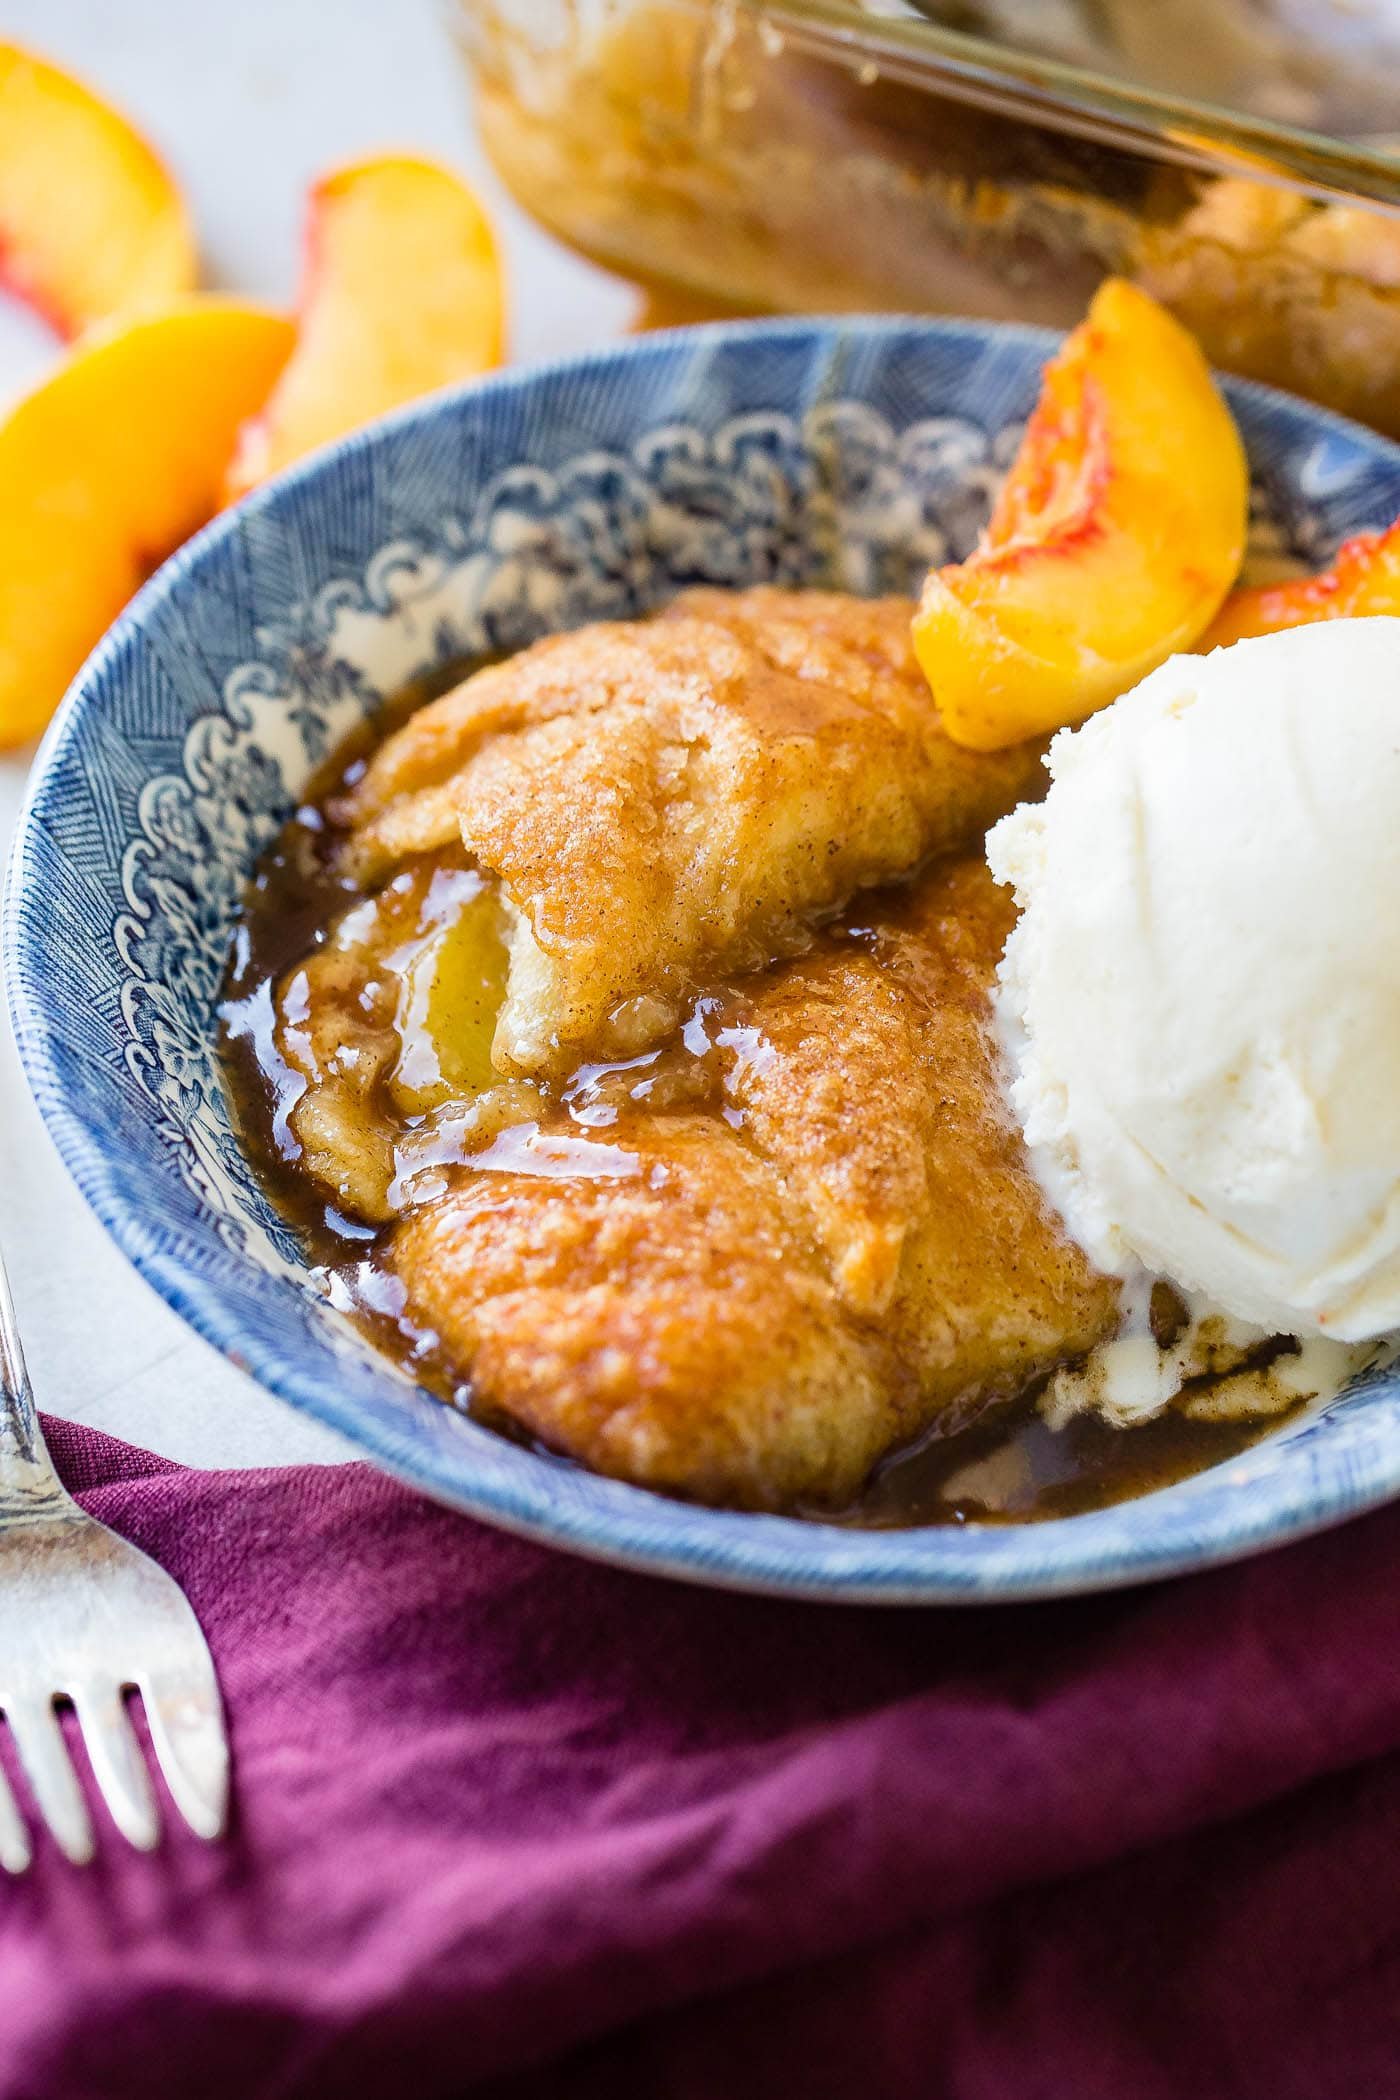 Peach Dumplings With Crescent Rolls